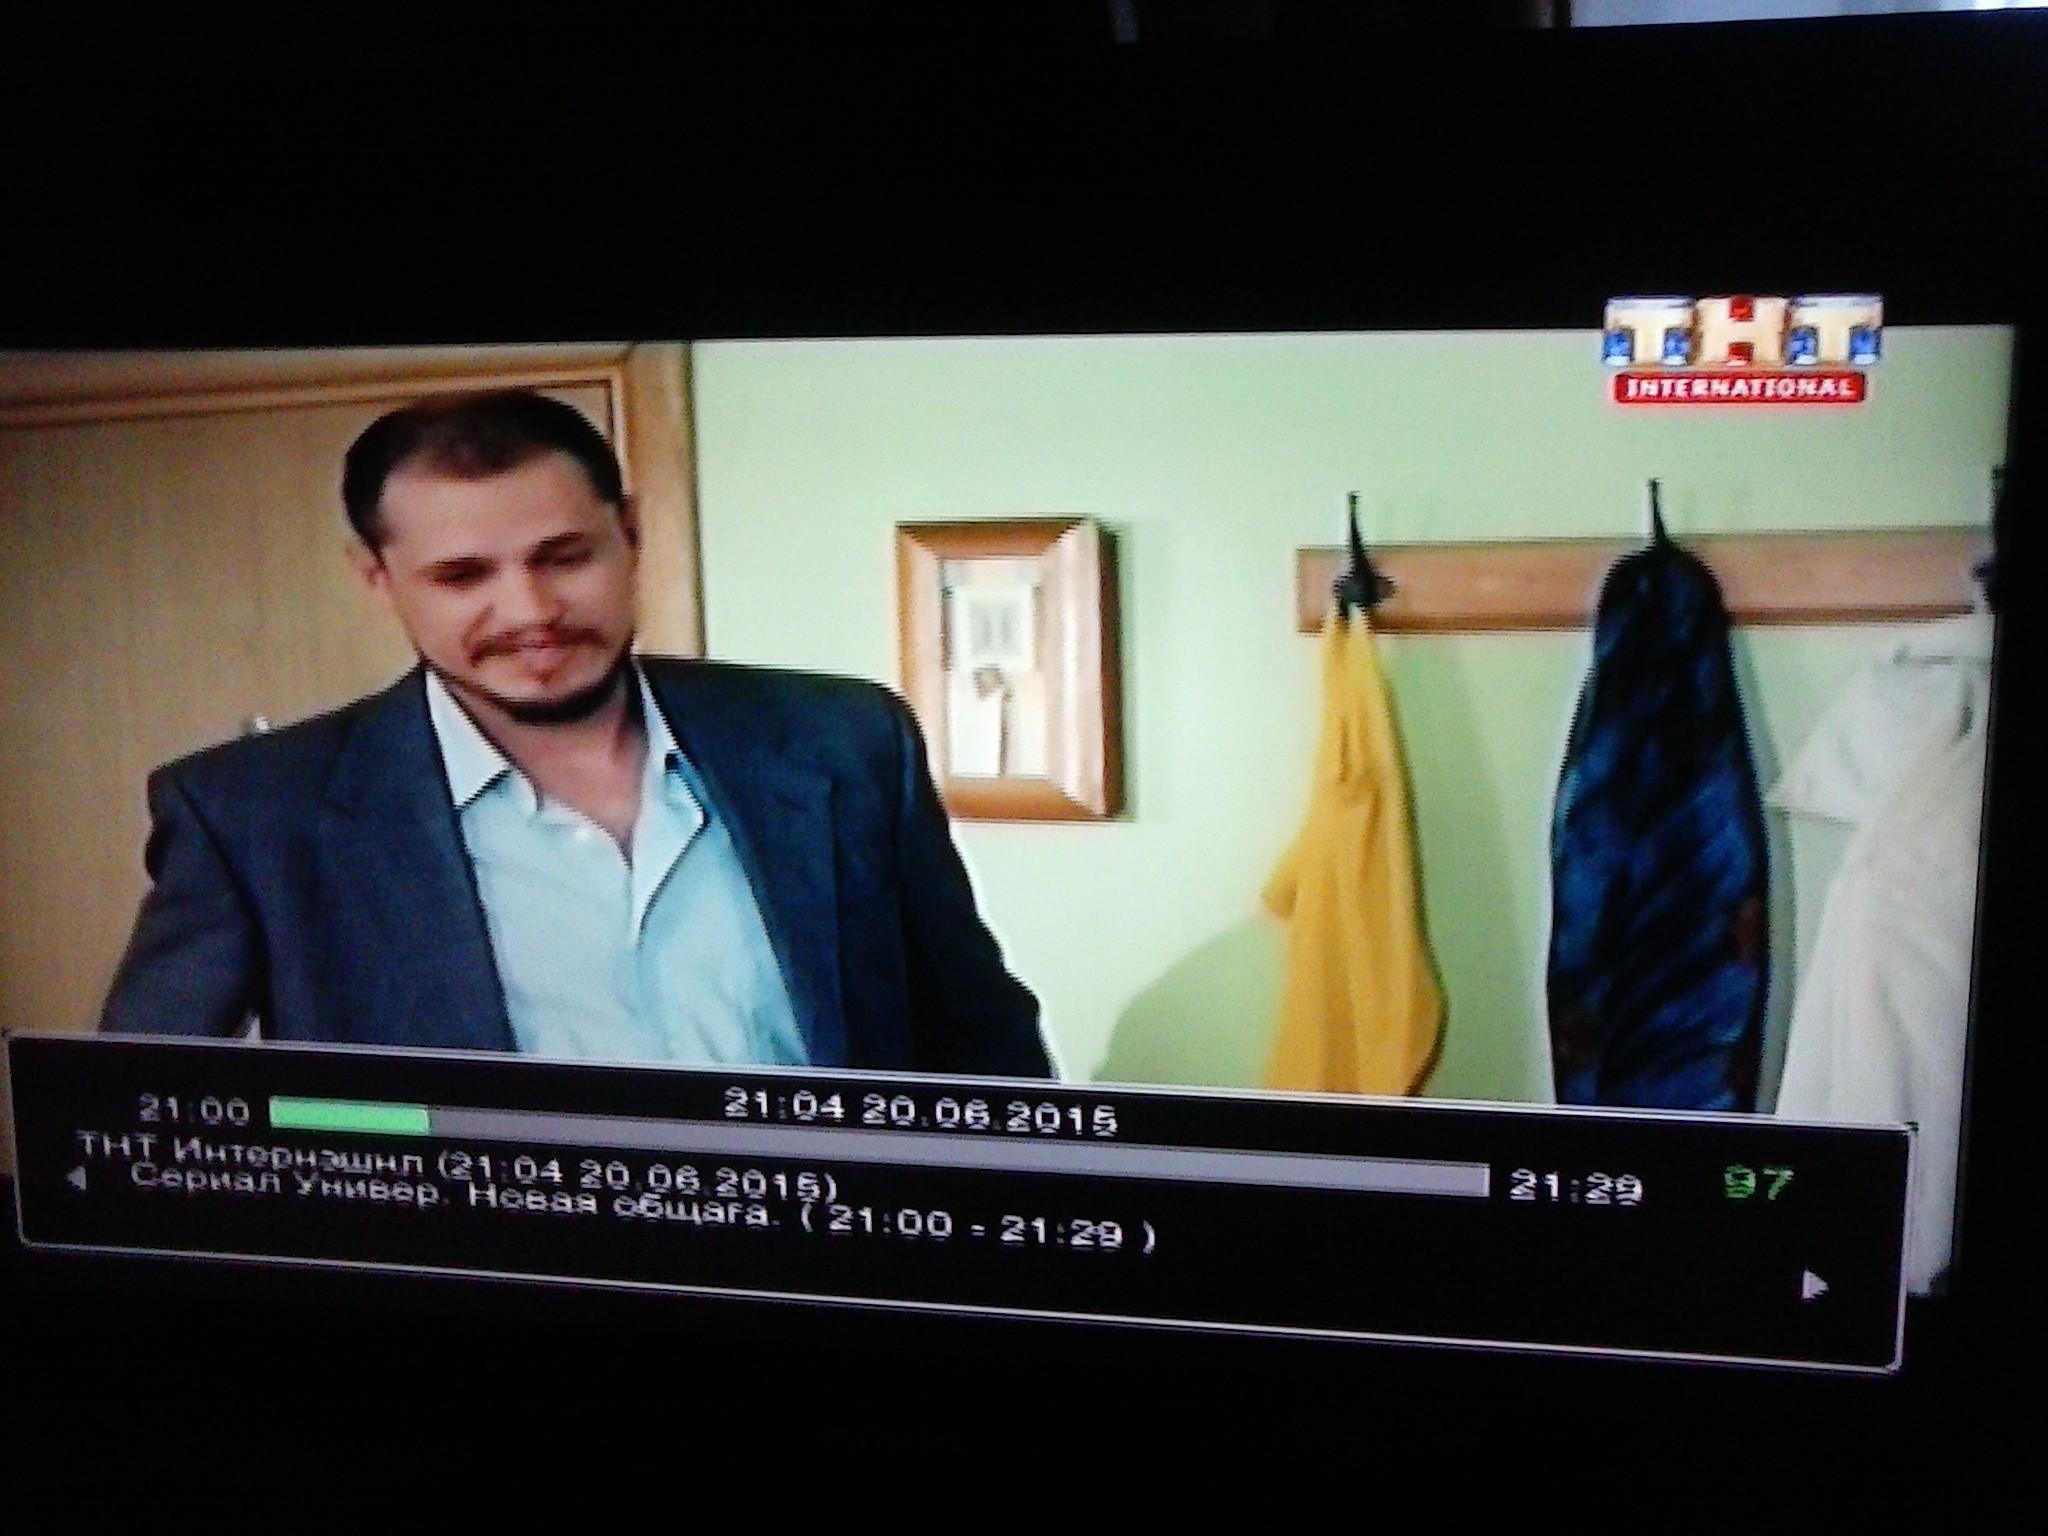 Телеканал ТНТ- INTERNATIONAL